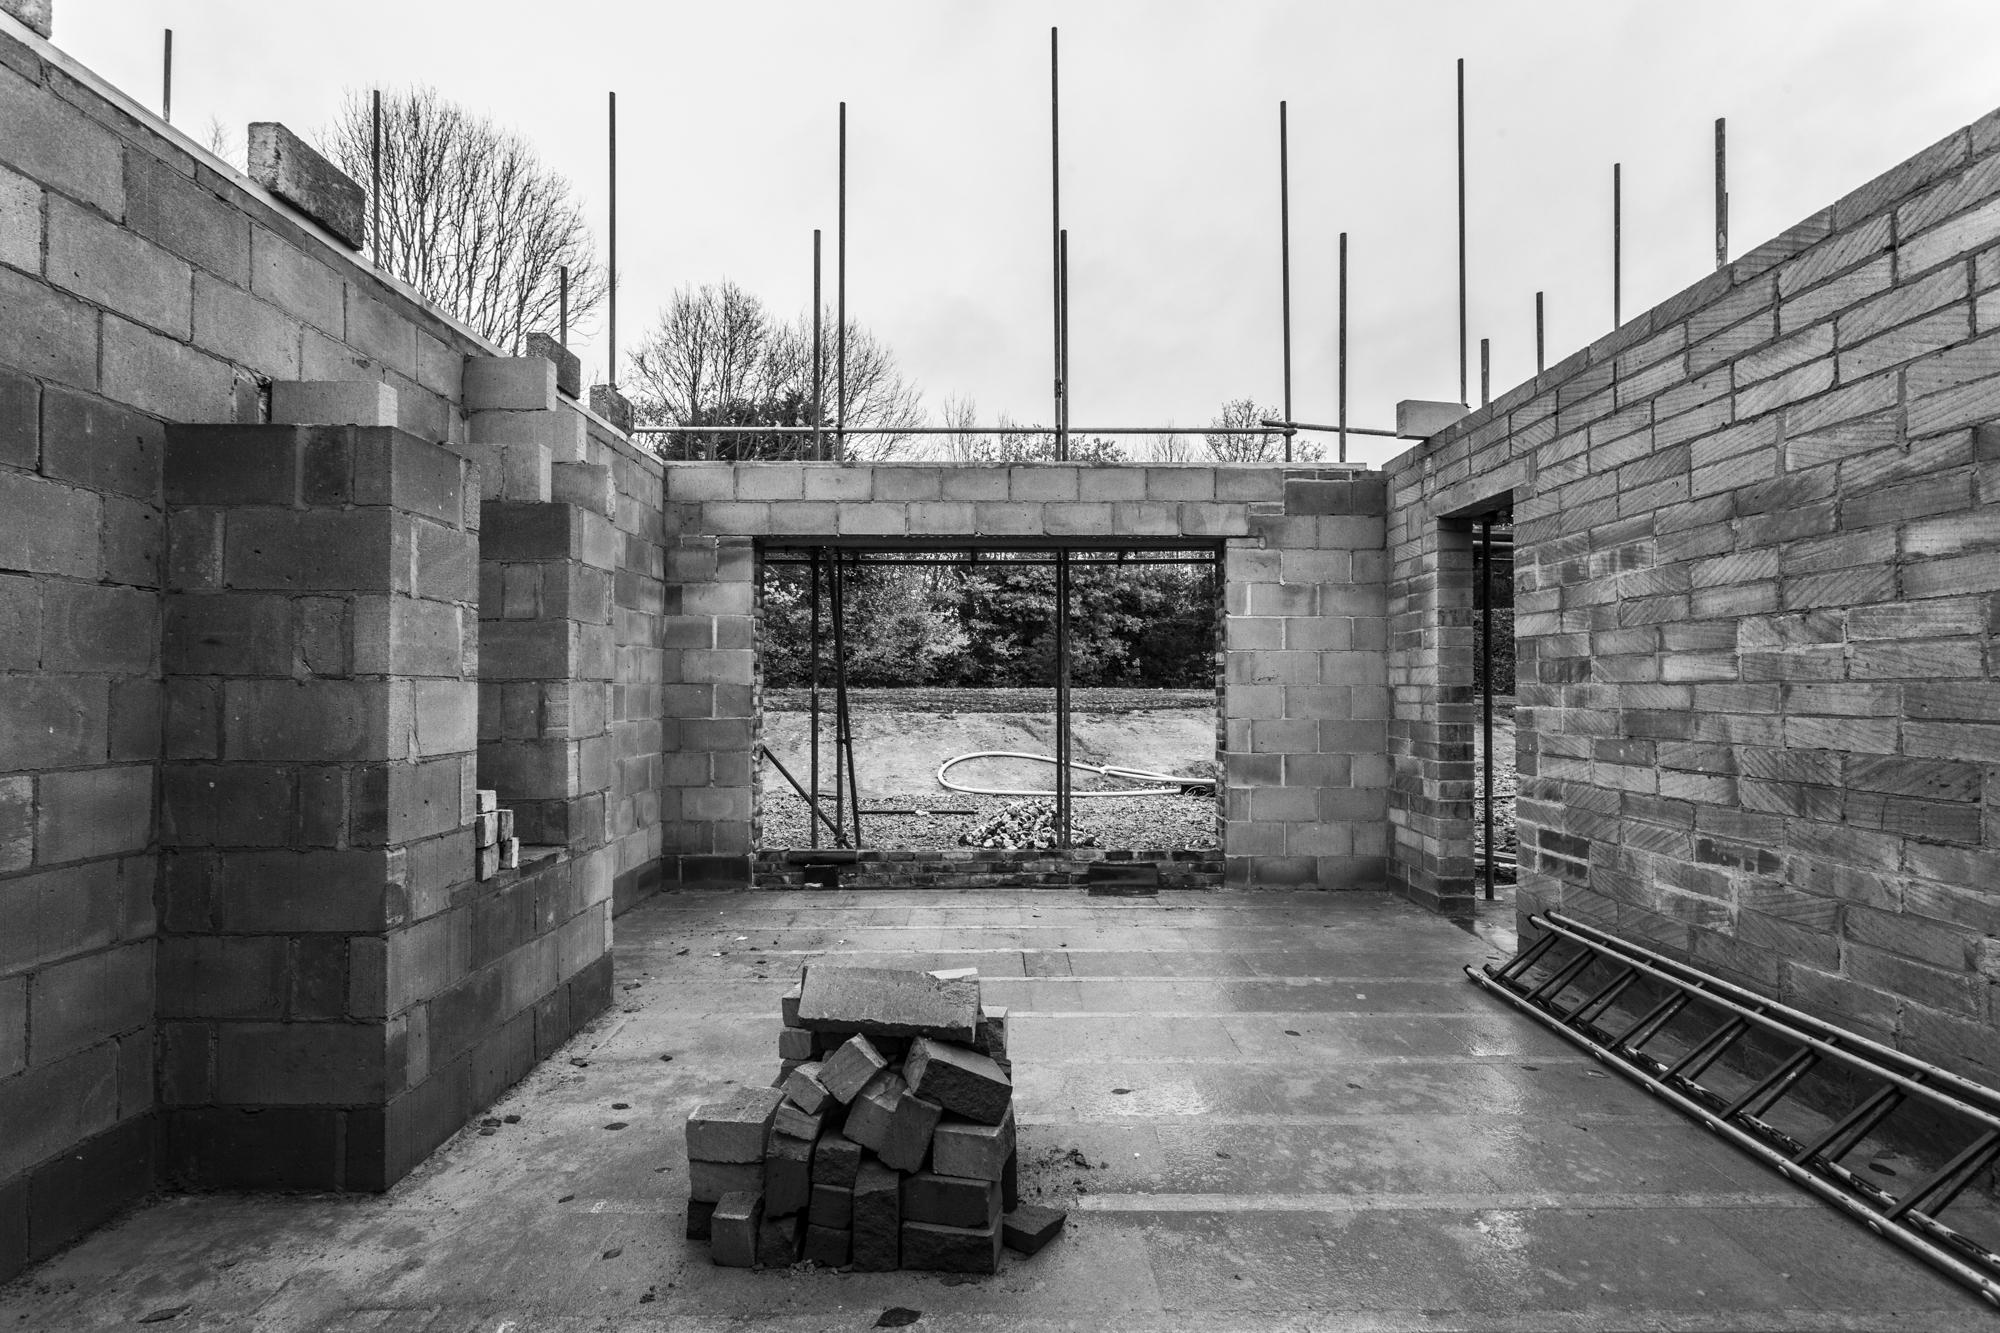 FlinthurstHouse_Construction_12.jpg